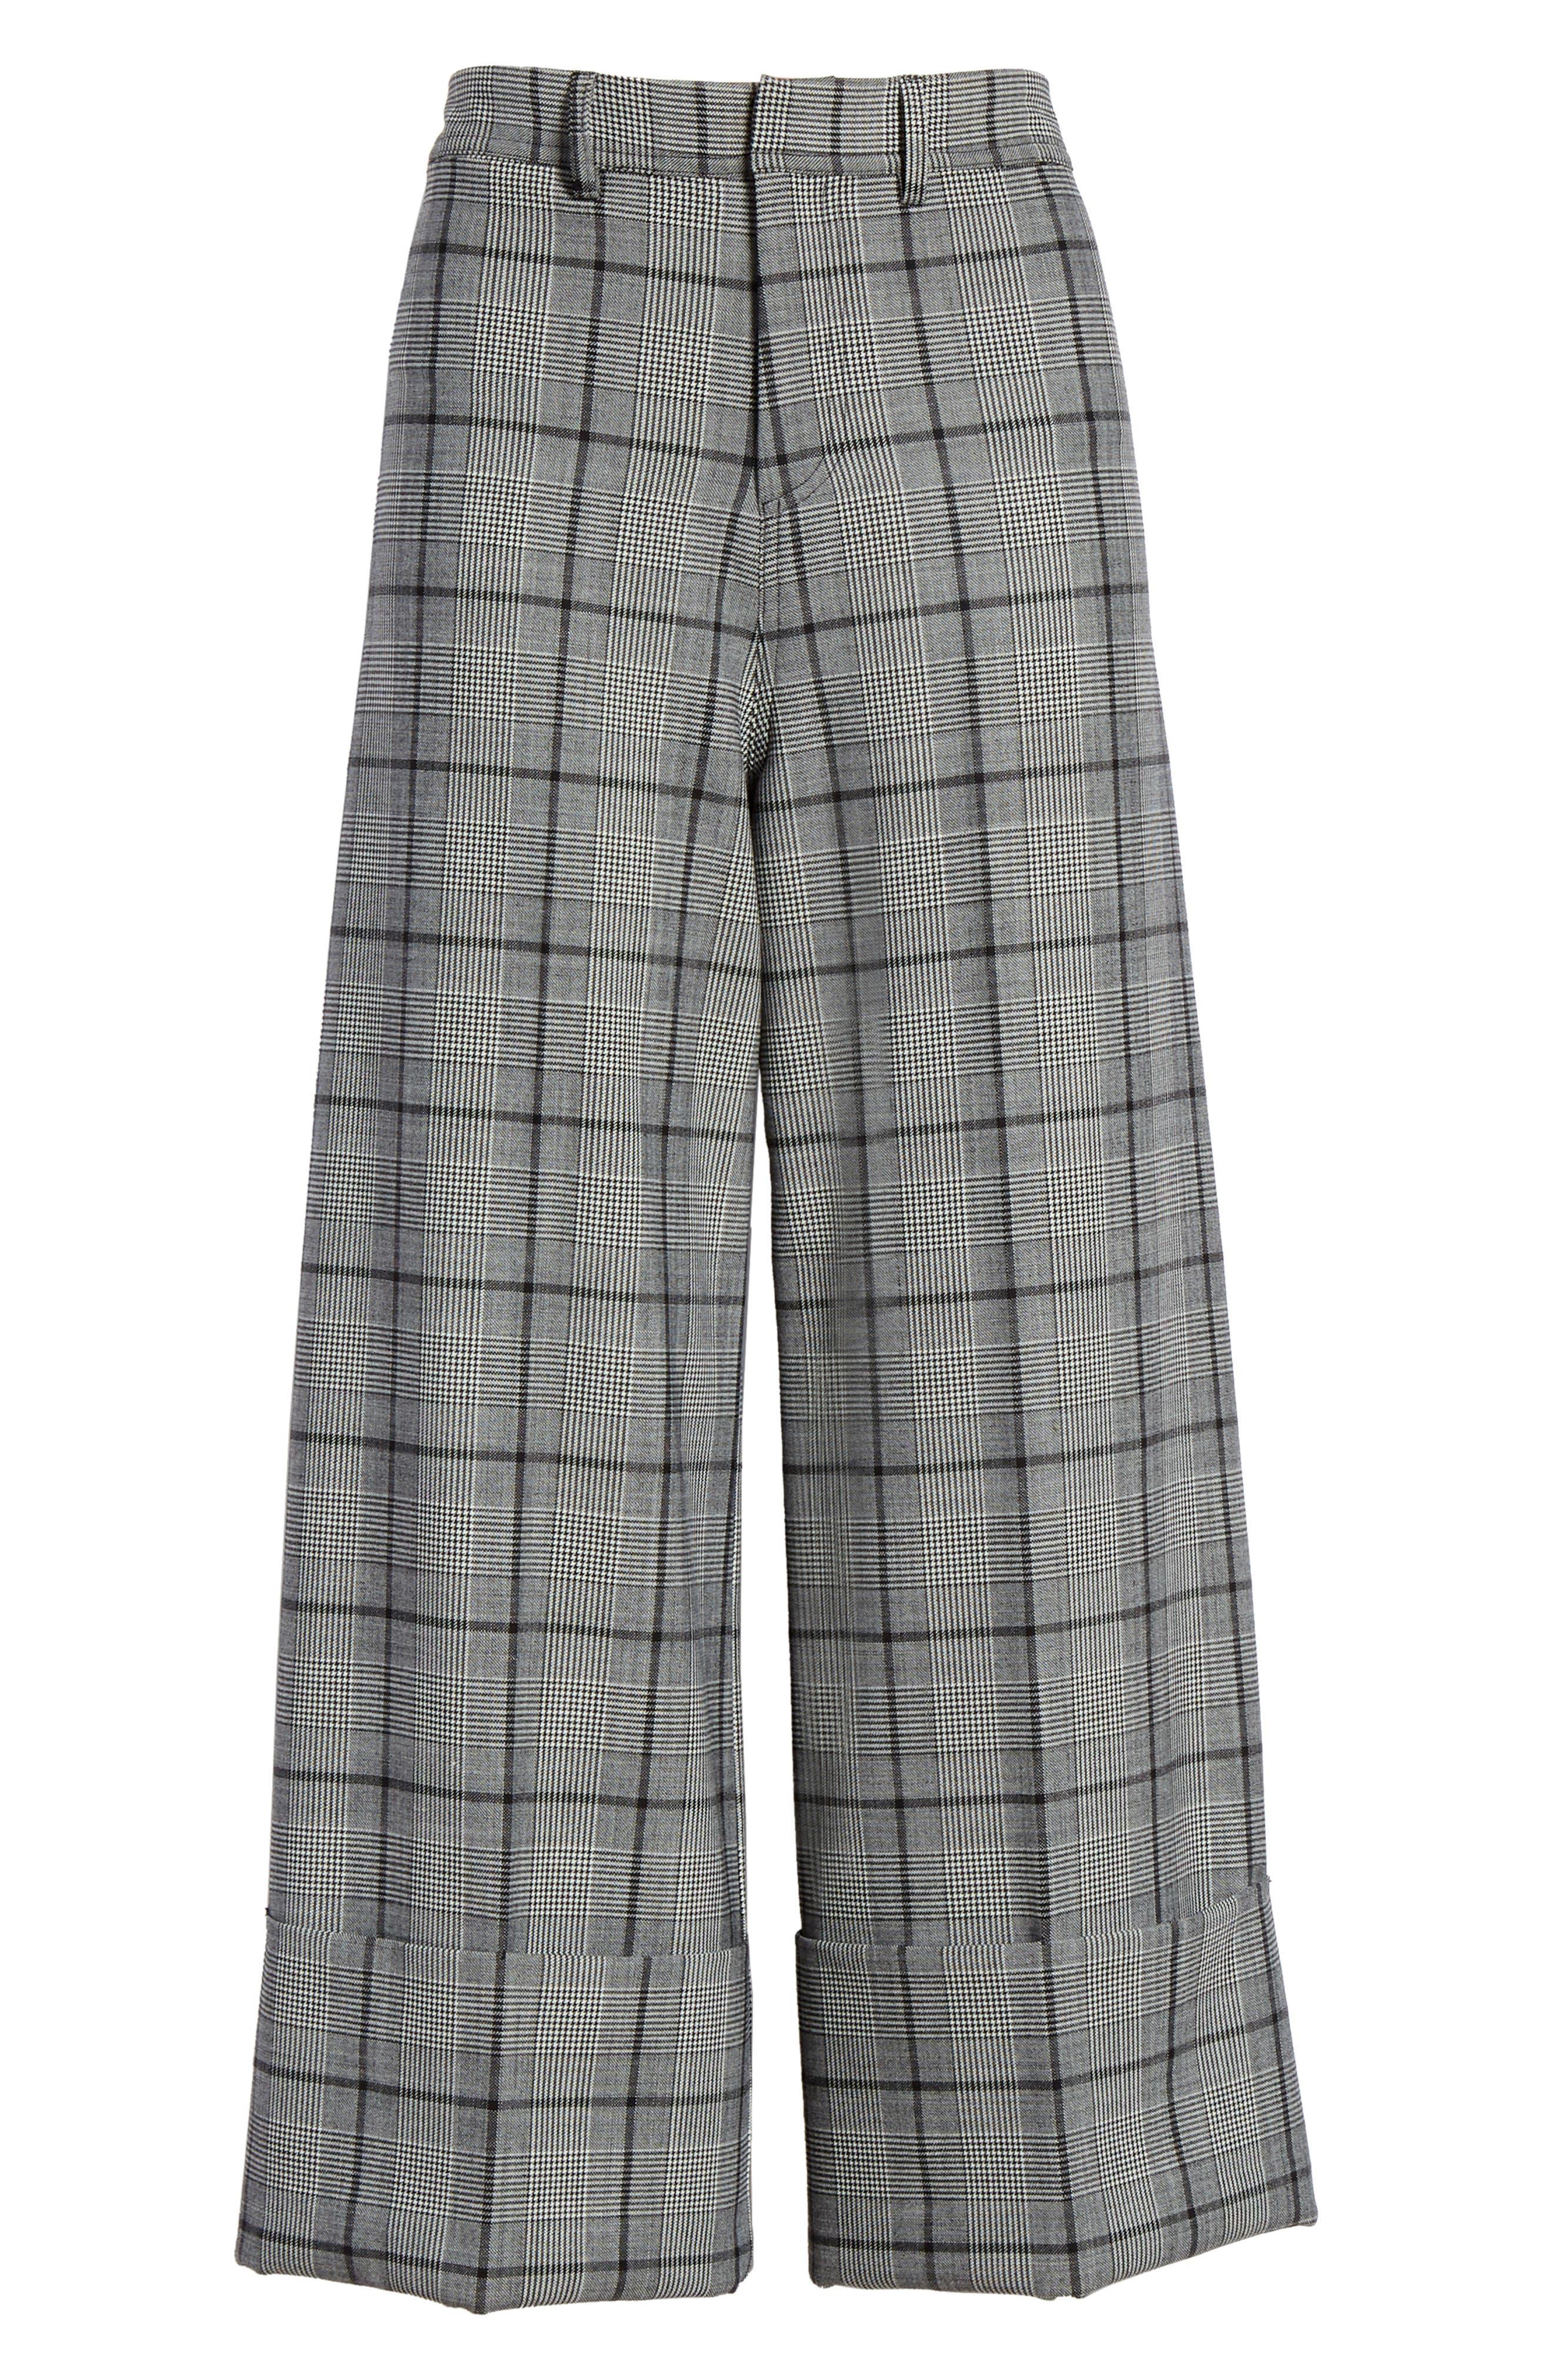 Bacall Cuff Crop Wide Leg Pants,                             Alternate thumbnail 6, color,                             028